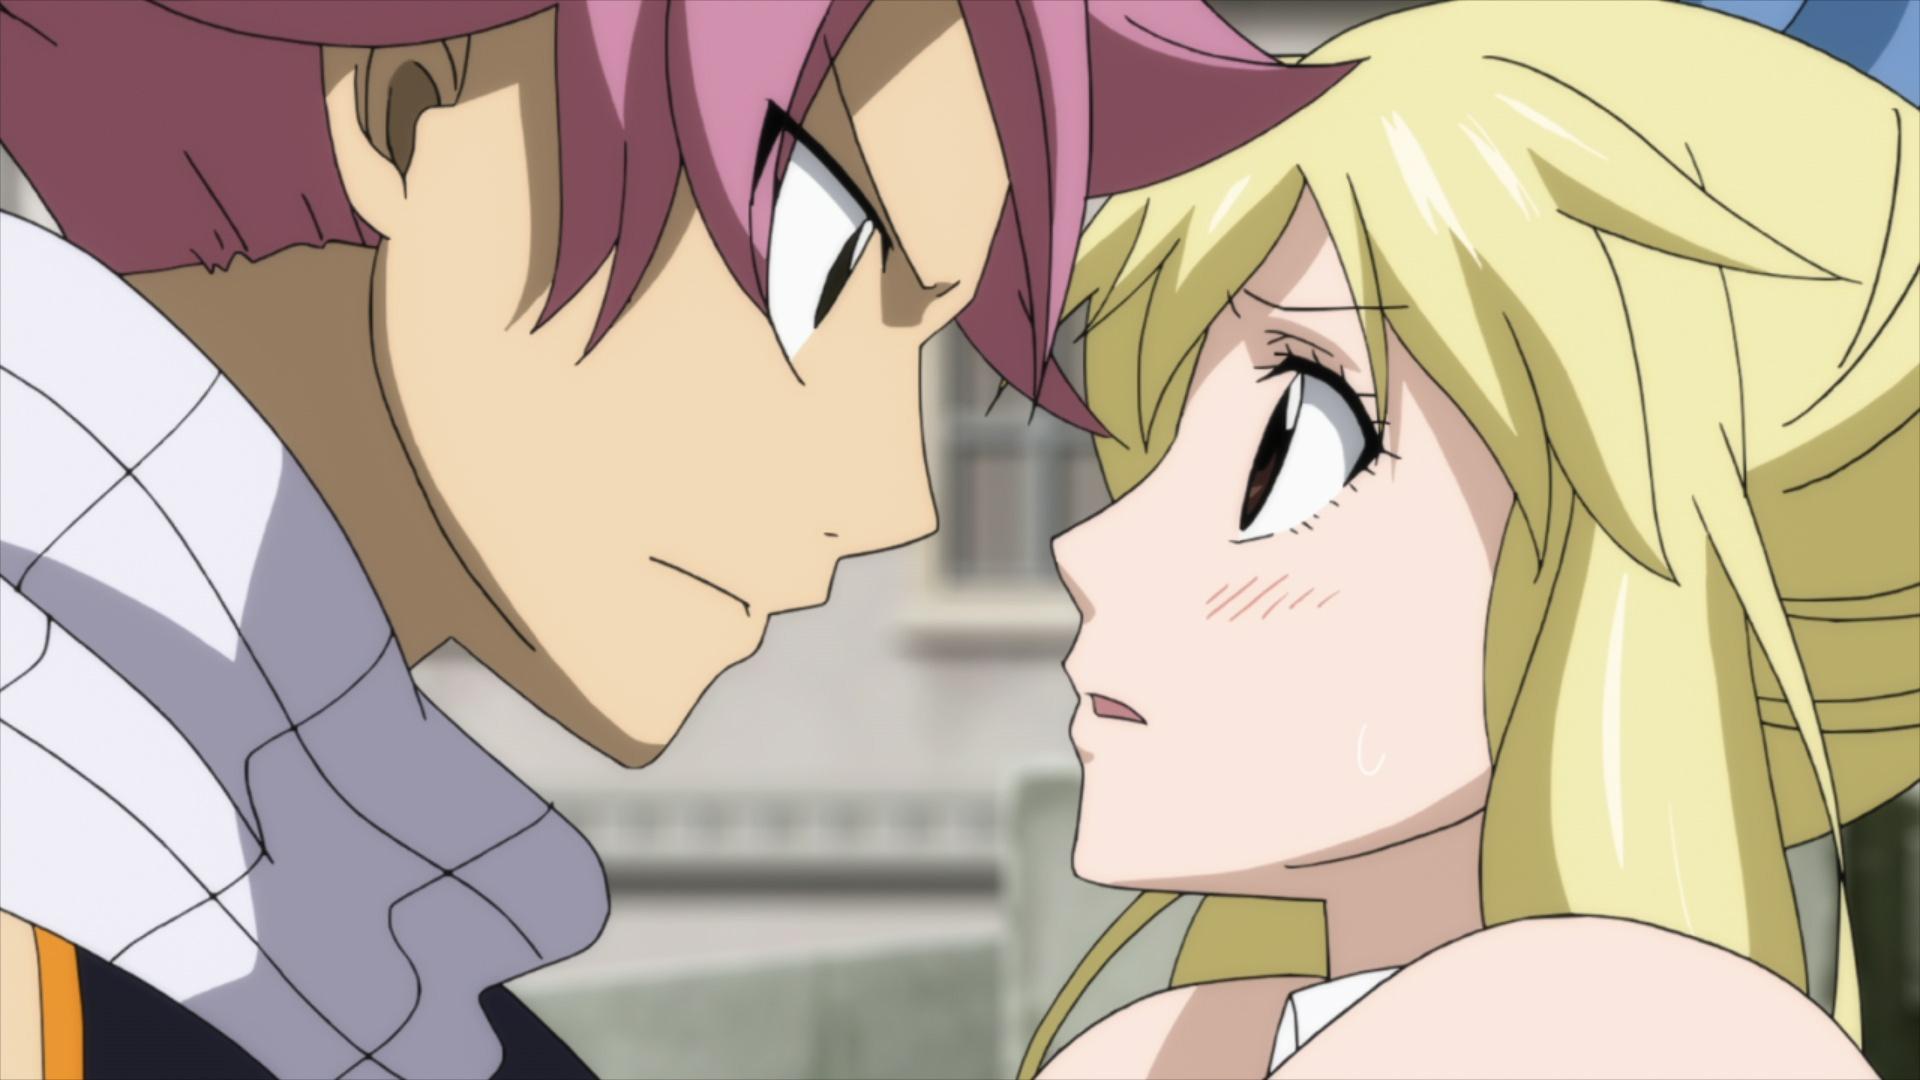 Watch Fairy Tail Season 9 Episode 280 Sub & Dub | Anime